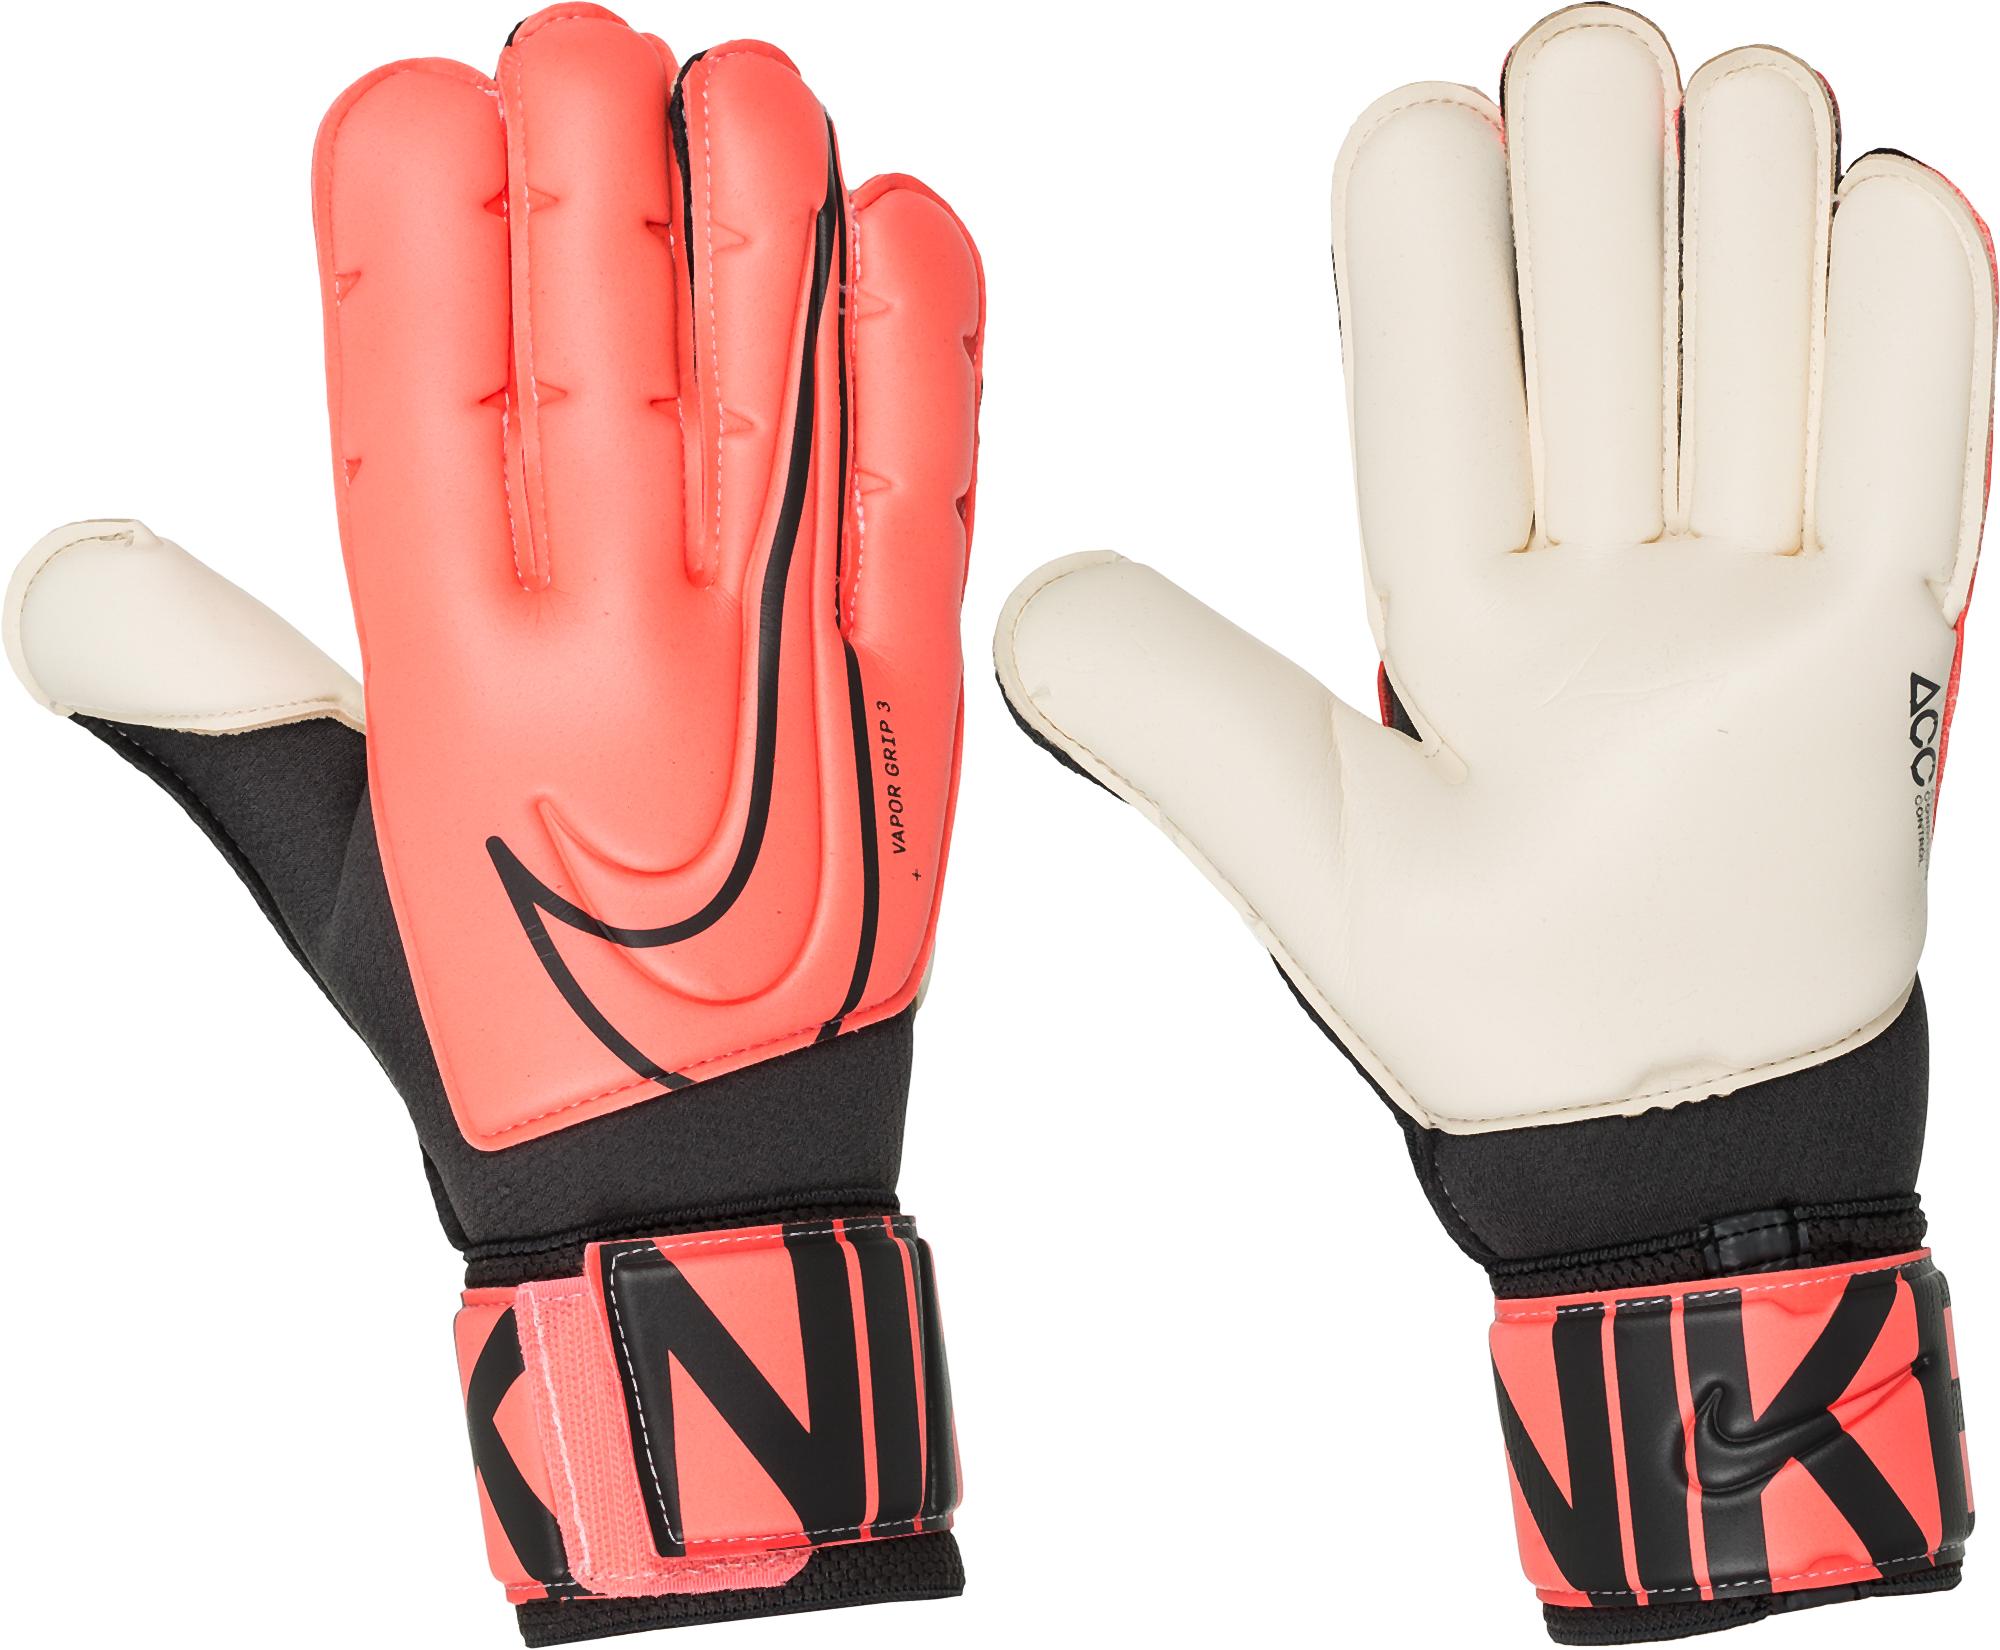 цена Nike Перчатки вратарские Nike Goalkeeper Vapor Grip3, размер 9 онлайн в 2017 году